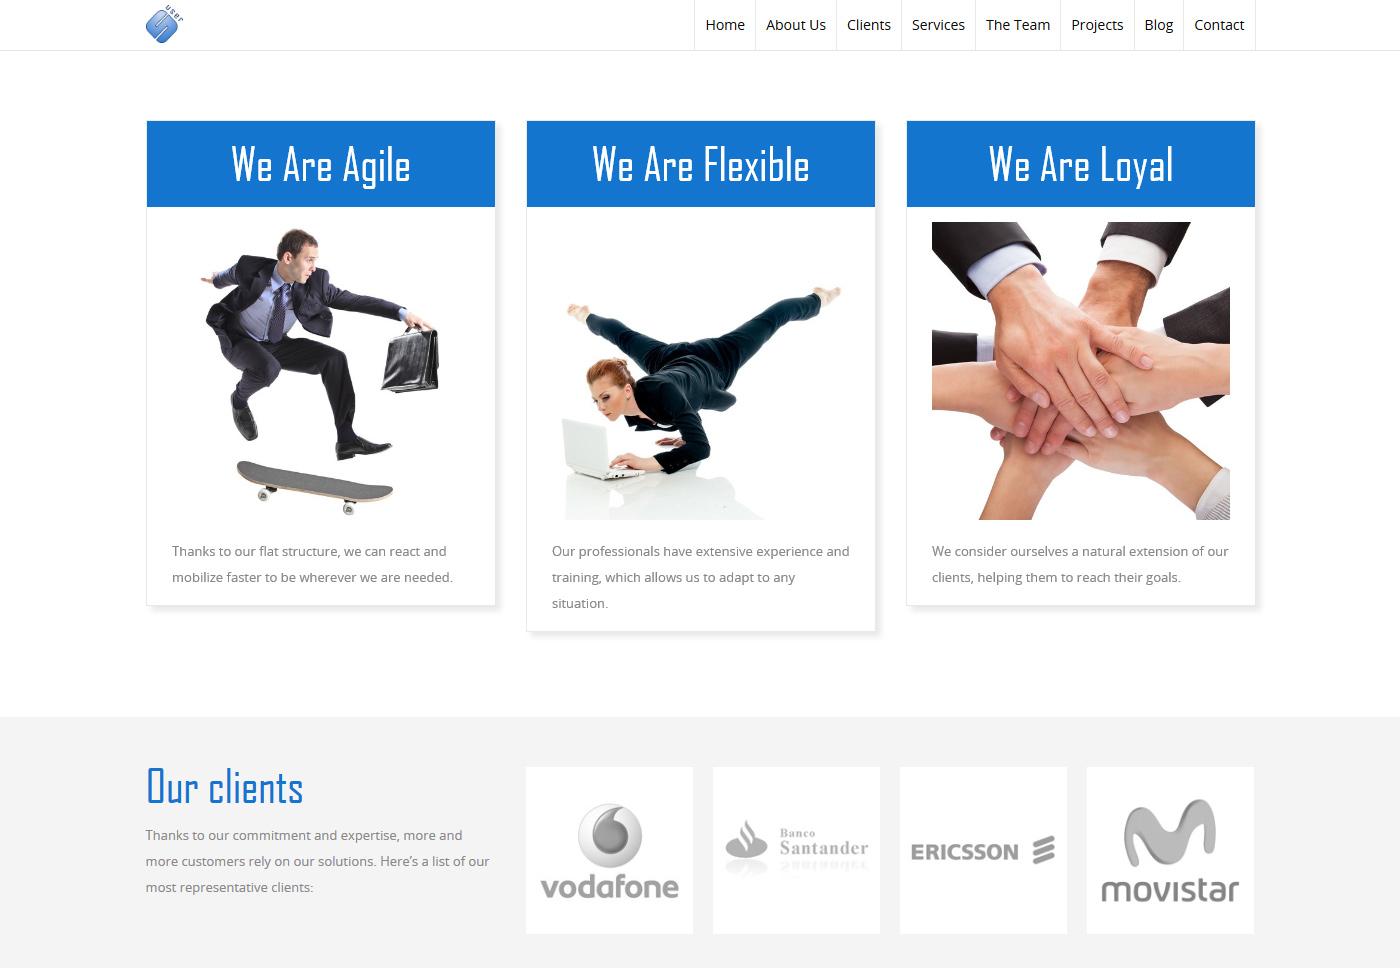 Super User - Imagen Corporativa y Web - Detalle